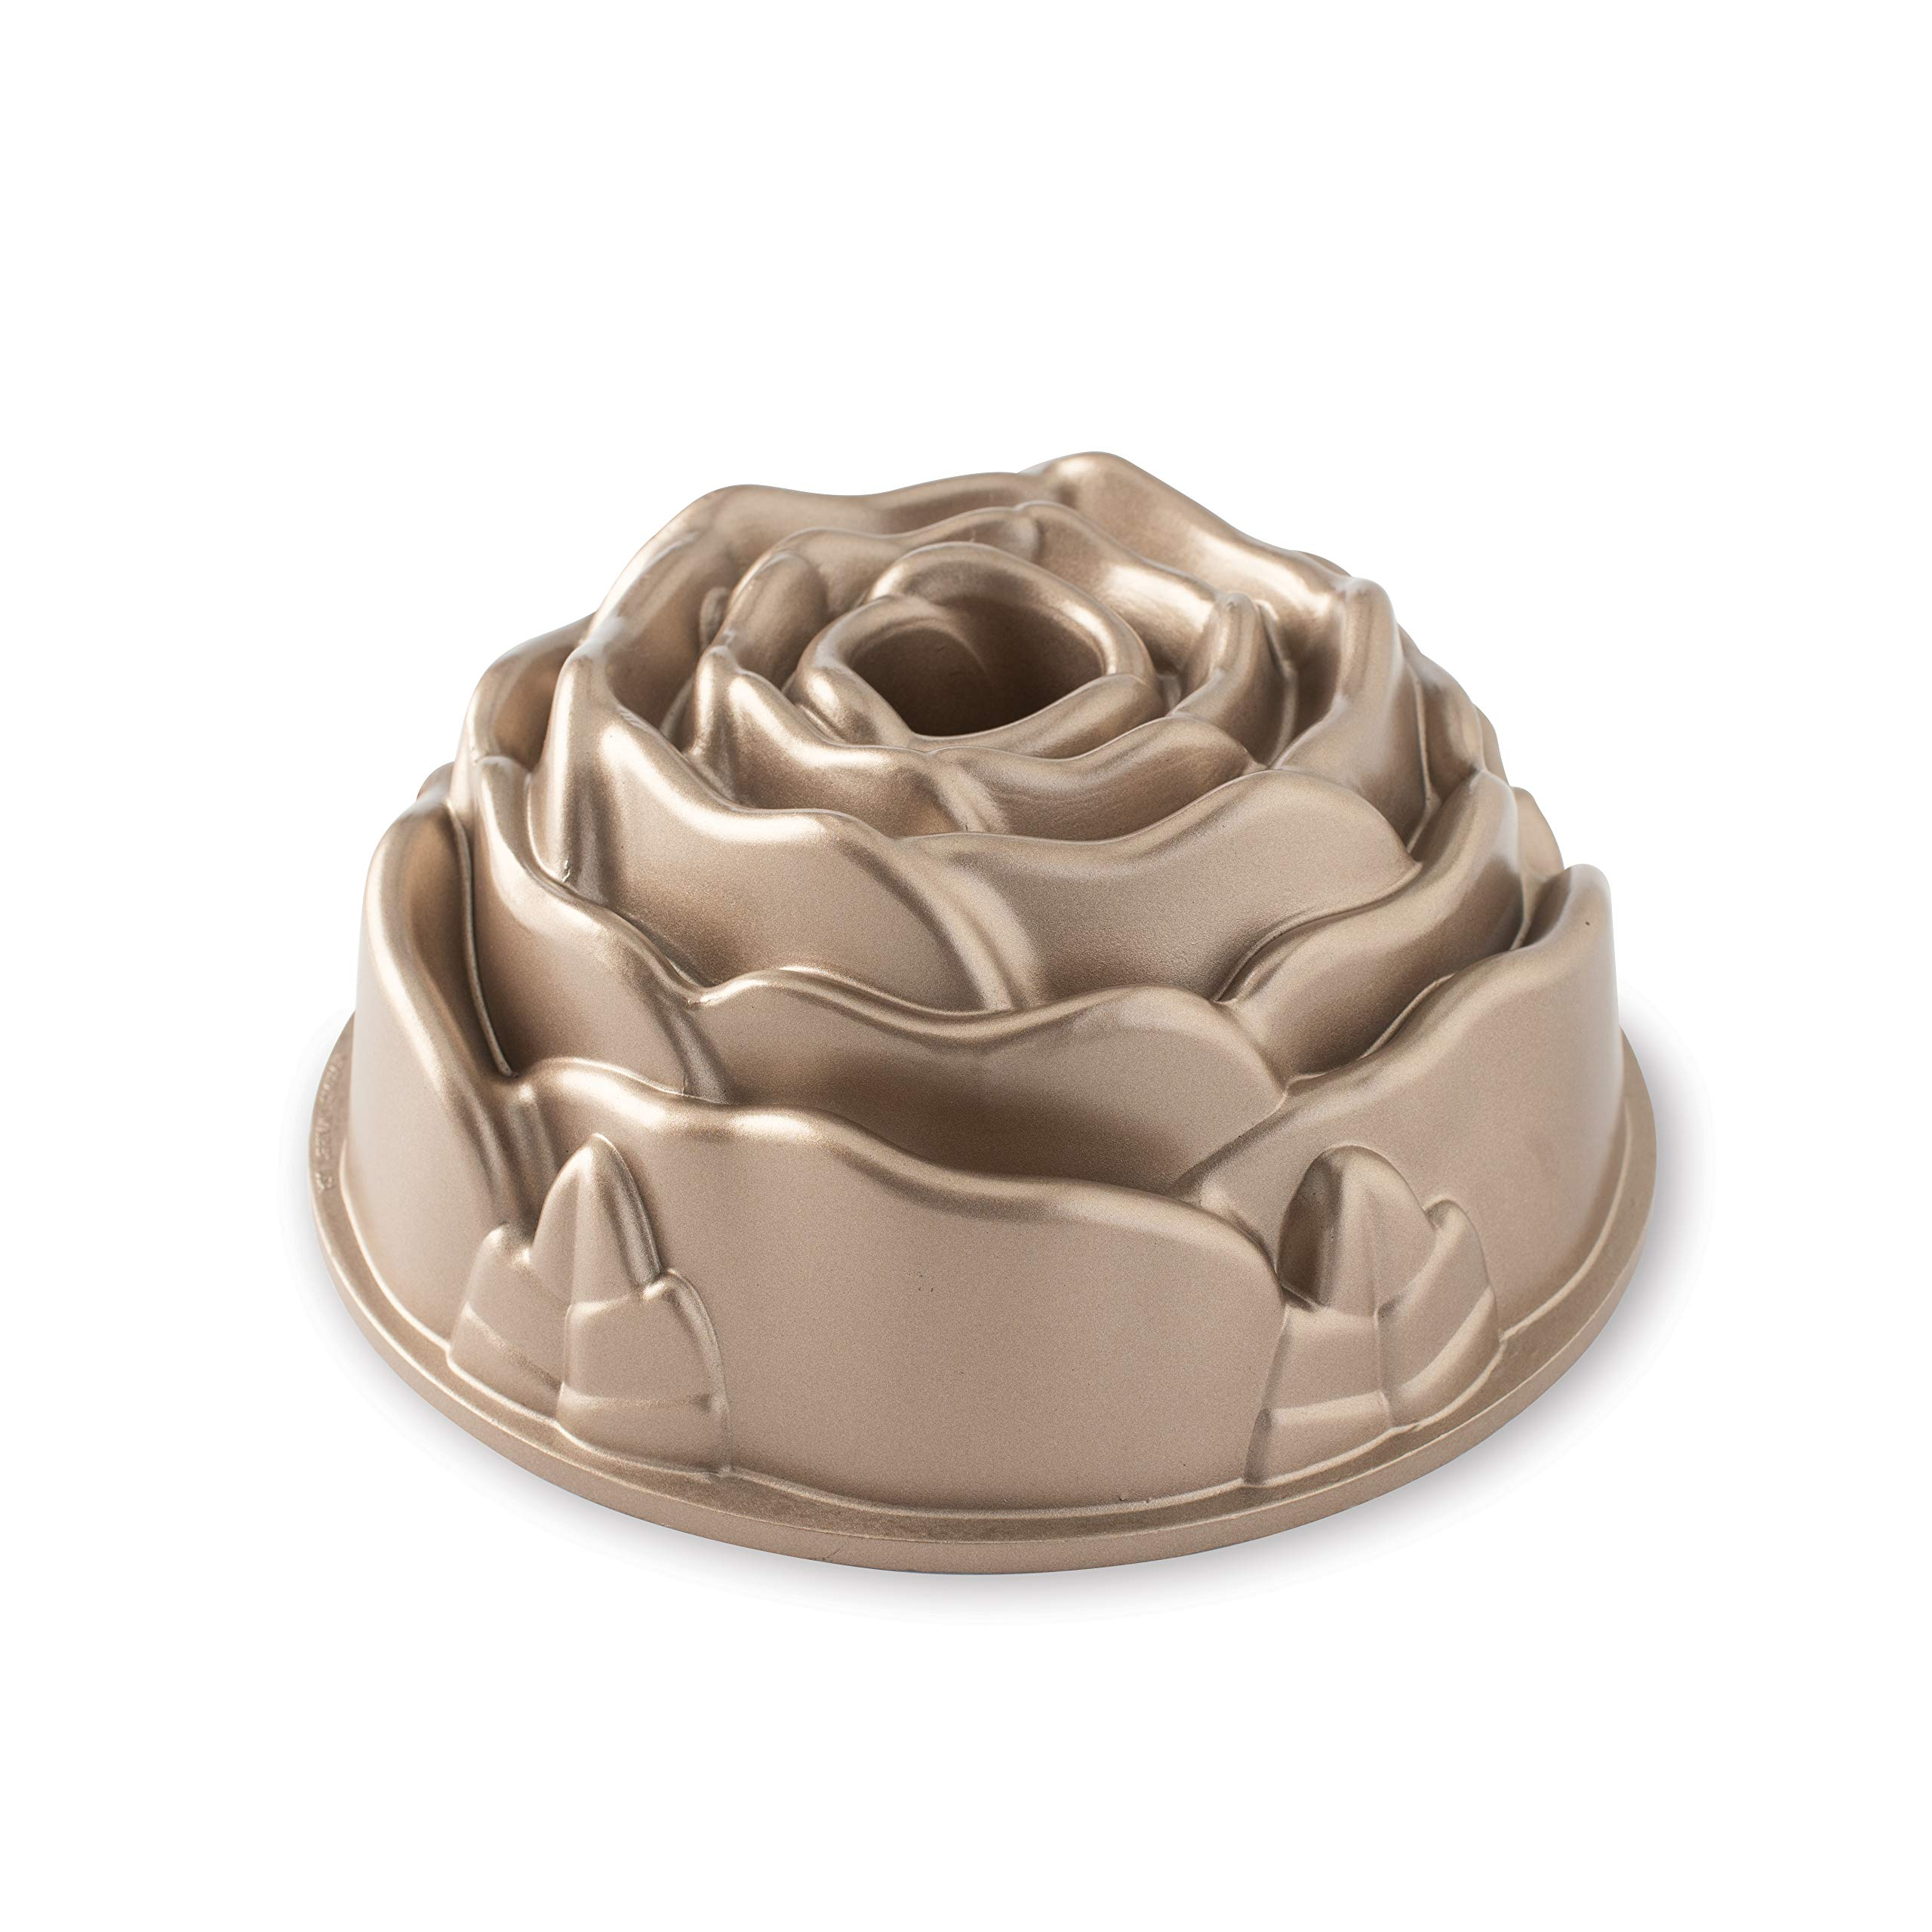 Nordic Ware Platinum Rose Cast Aluminum Bundt Pan, One size, copper